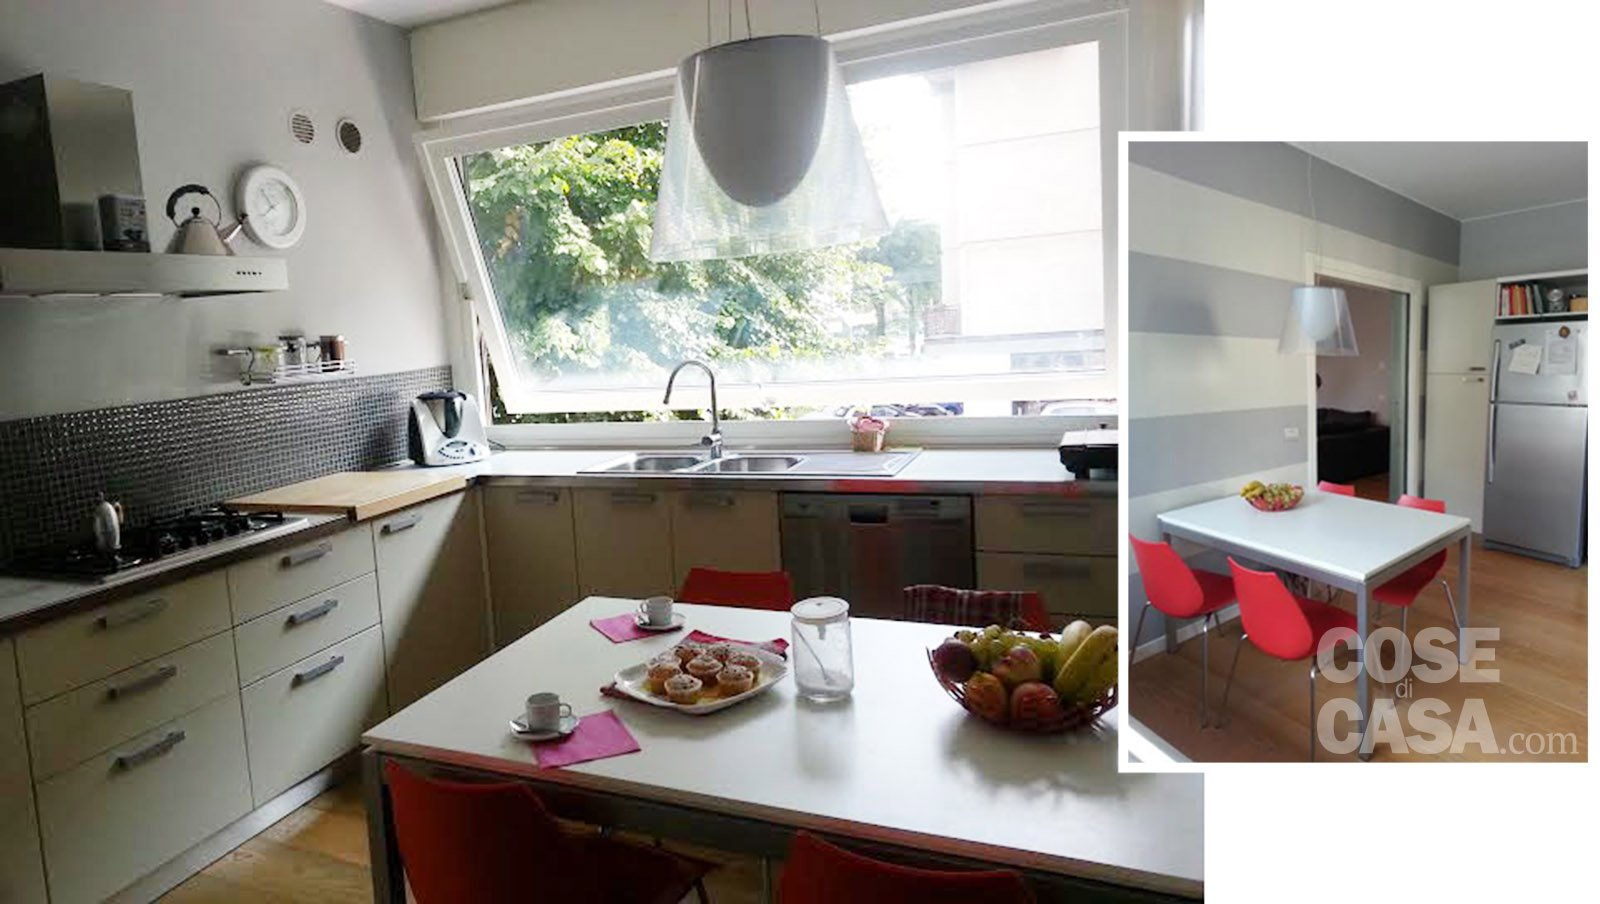 Costi cucine finest vista cucina lago vista with costi cucine fileccfcbf iw images yoshi with - Cucine in muratura costi ...